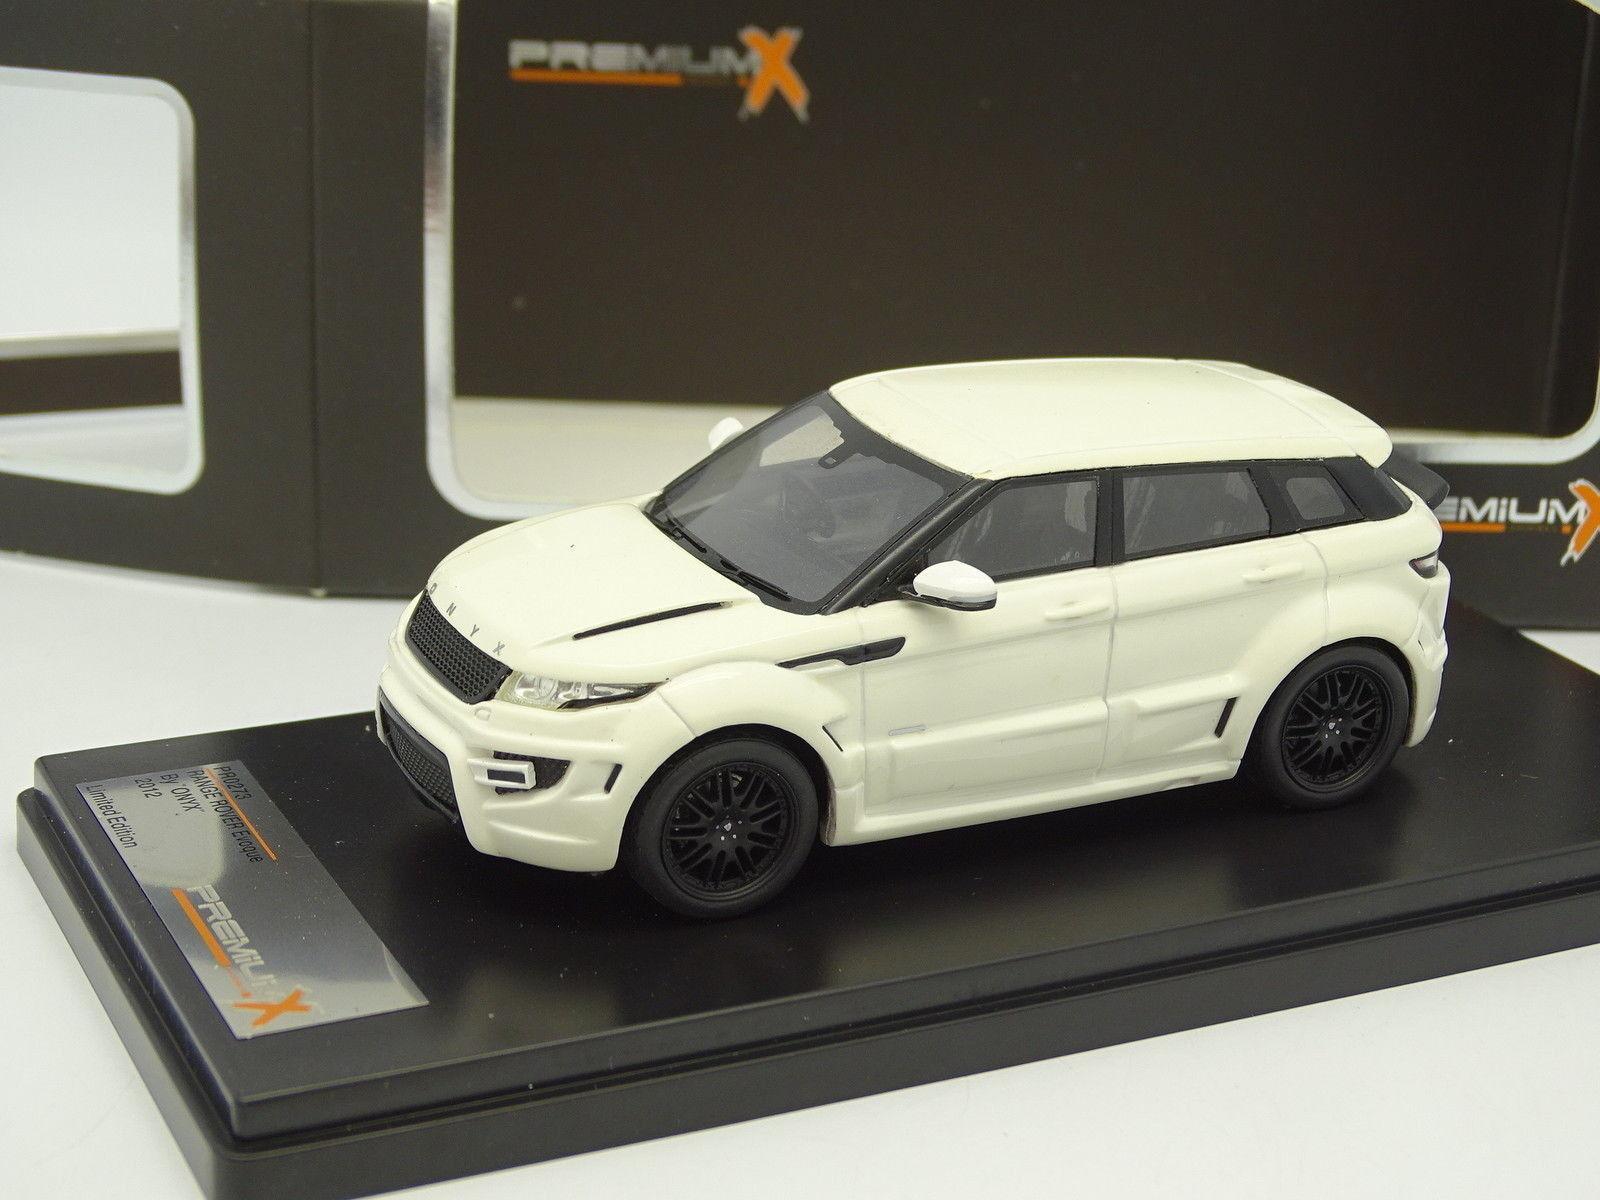 Premium X Résine 1 43 - Range Rover Evoque Onyx 2012 whitehe